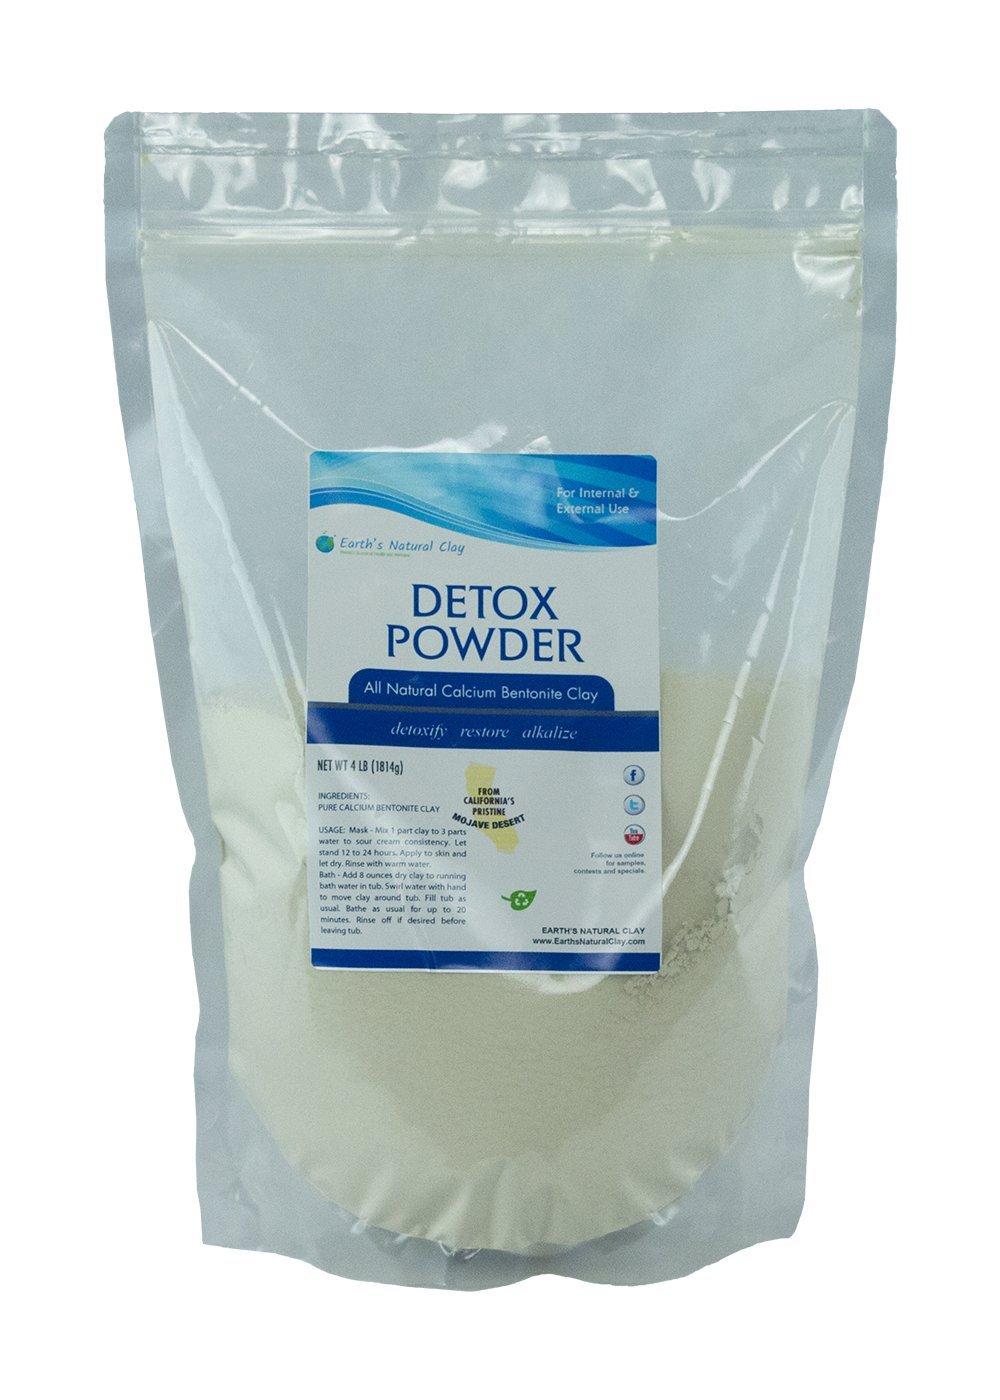 Calcium Bentonite Clay Powder | Food Grade Clay For Internal and External Use | 4 lbs (64 oz) | Pharmaceutical Grade Montmorillonite | Detox and Healing | by Earth's Natural